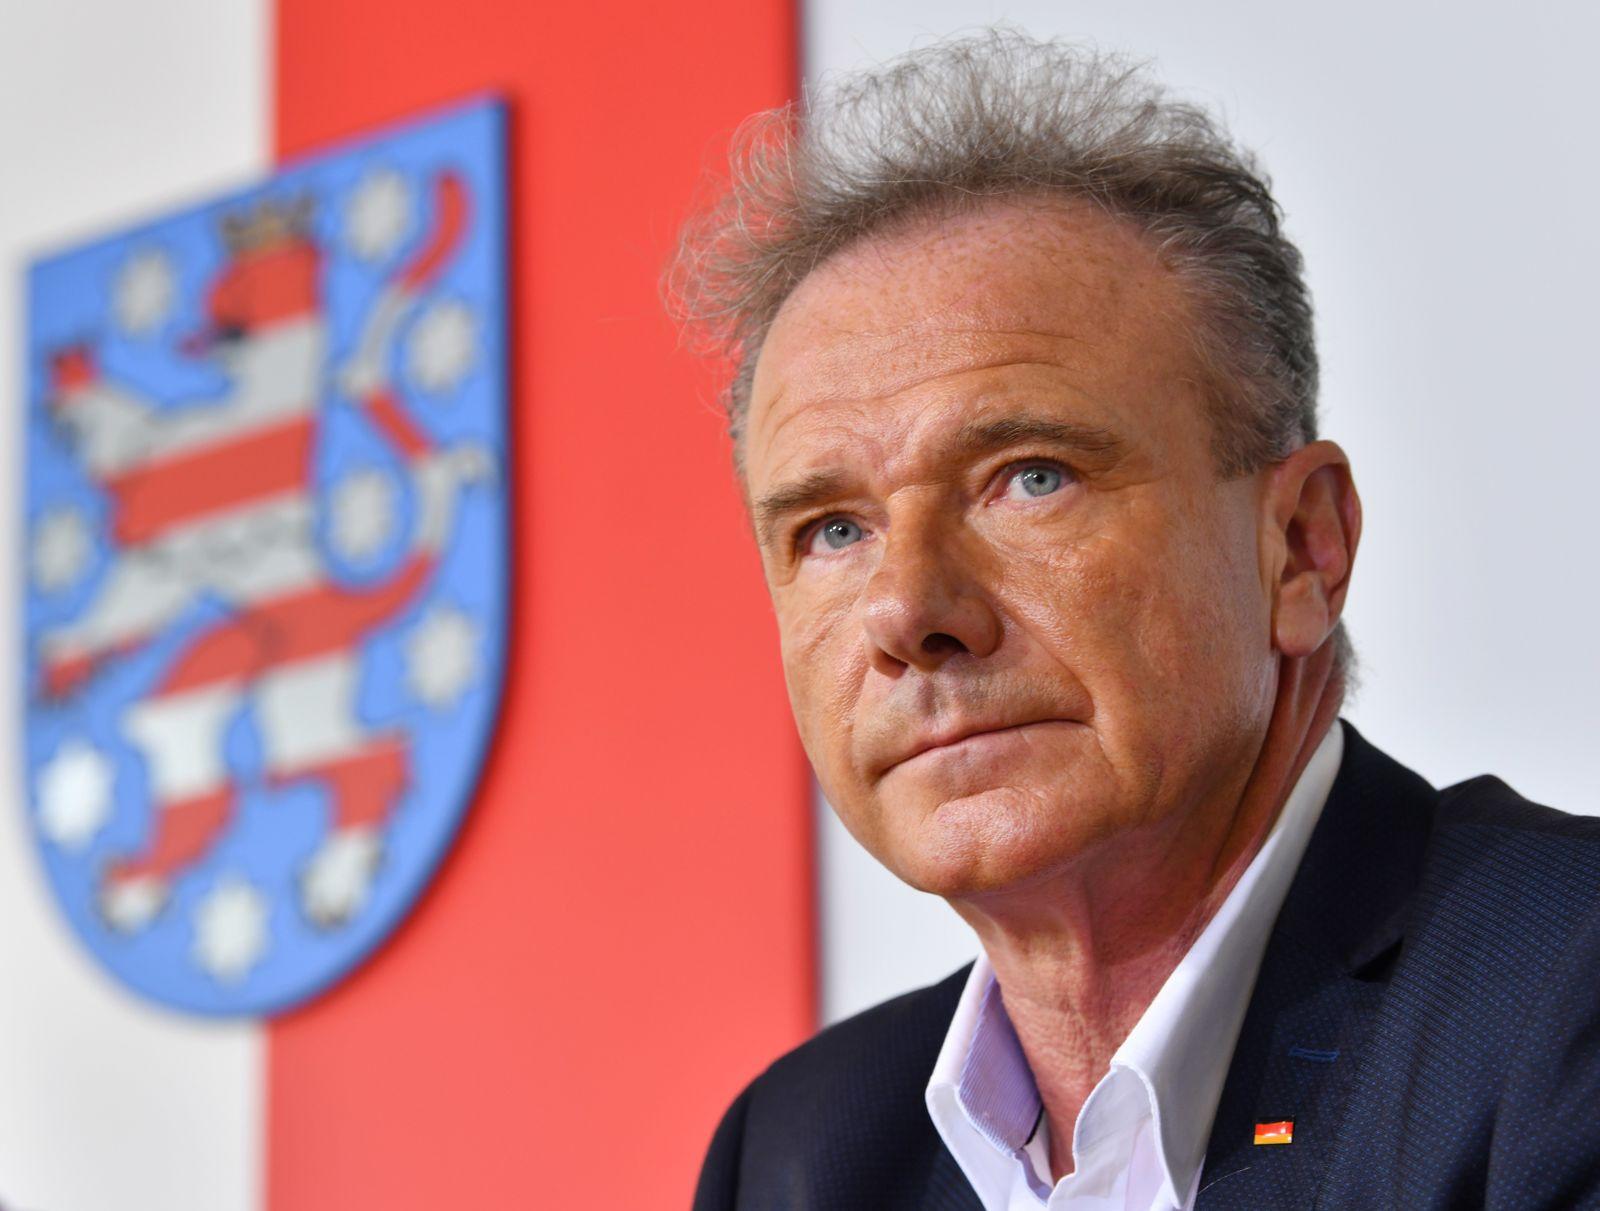 Thüringer CDU-Landtagsabgeordneten Michael Heym